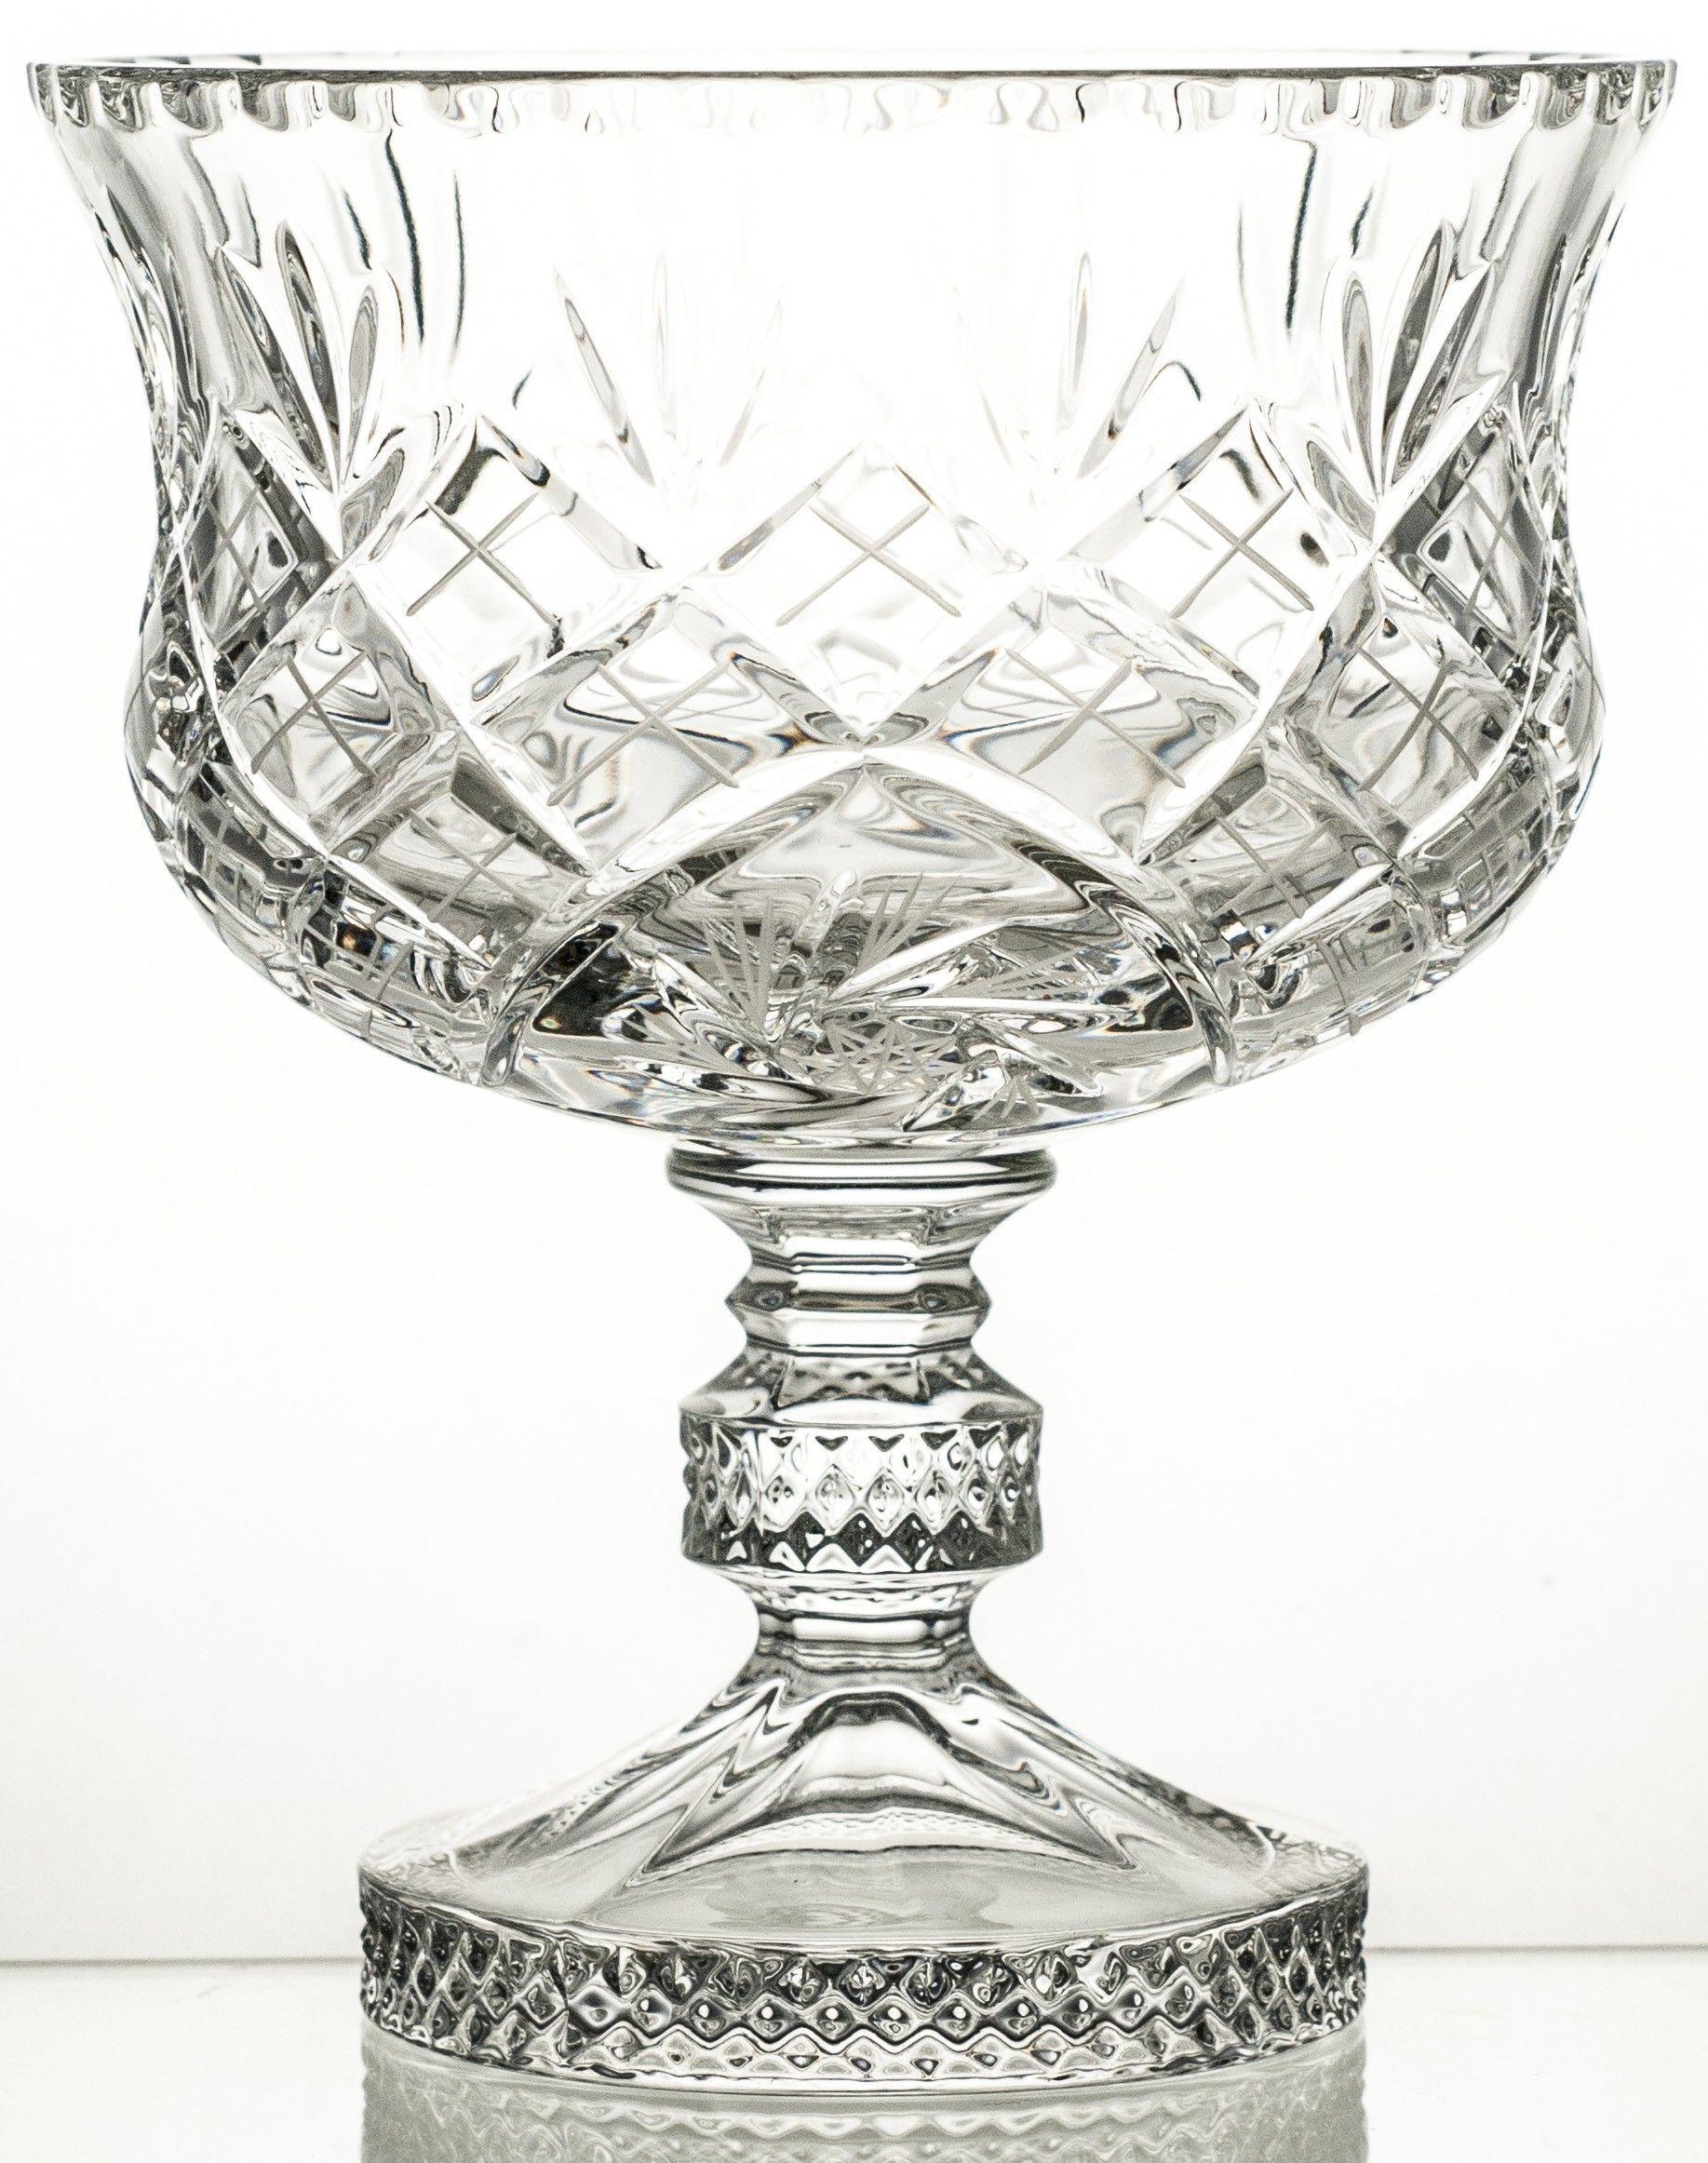 Owocarka kryształowa (05995)